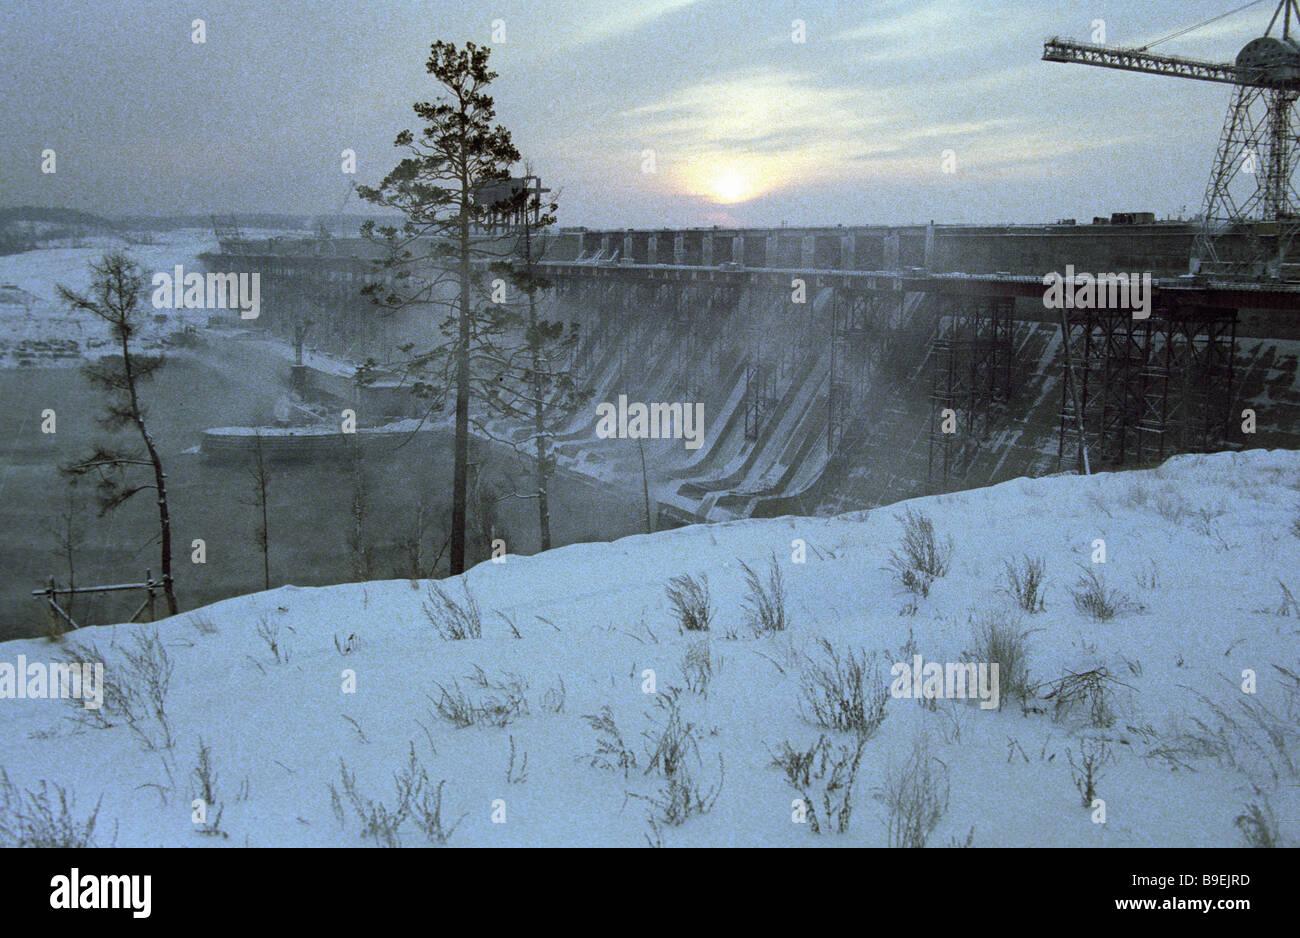 HPP Ust-Ilim: location, power, photo 54